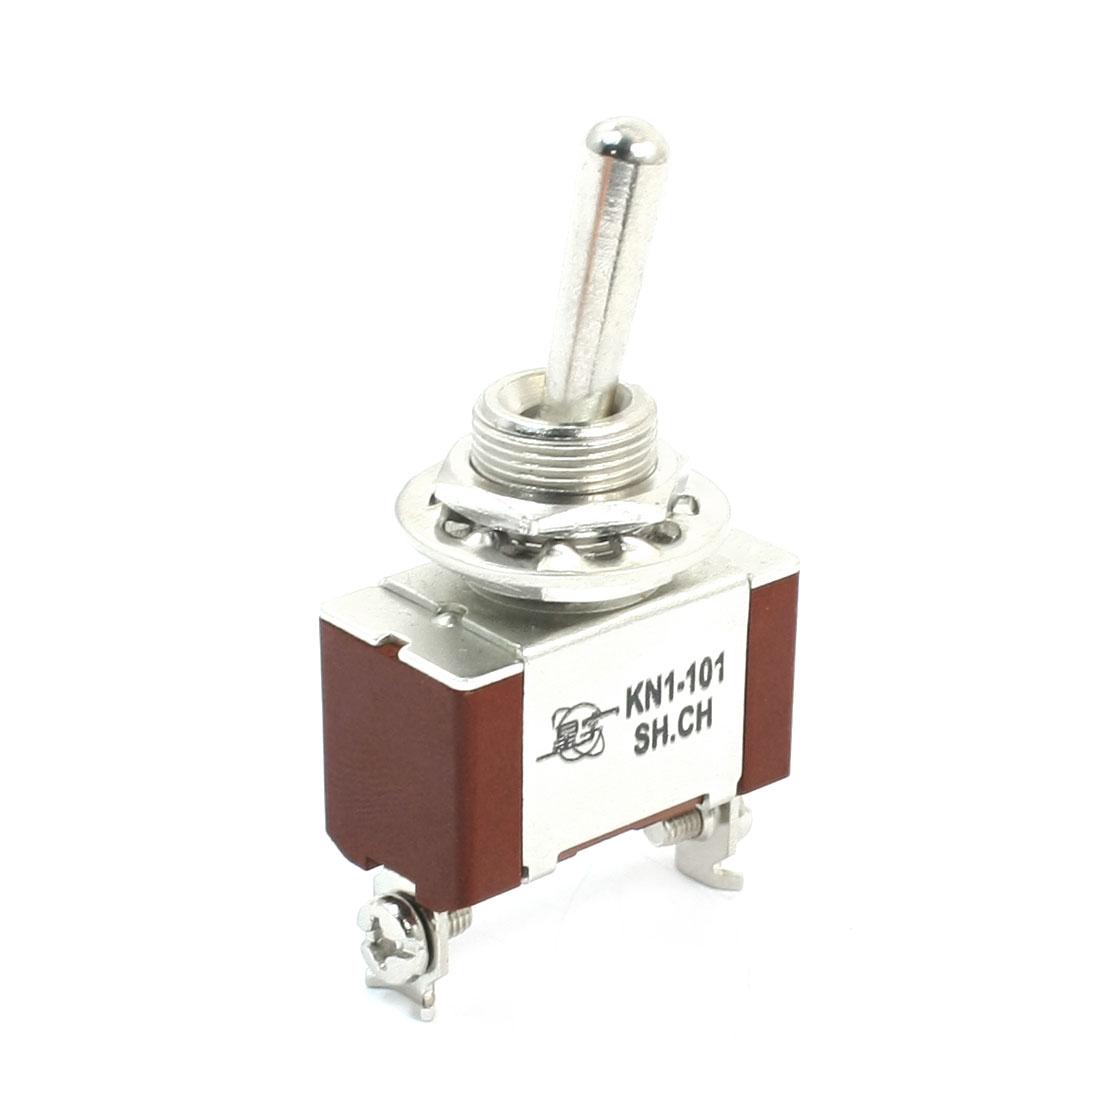 KN1-101 SPST 2 Way Locking Rocker Type Toggle Switch AC 250V 8A